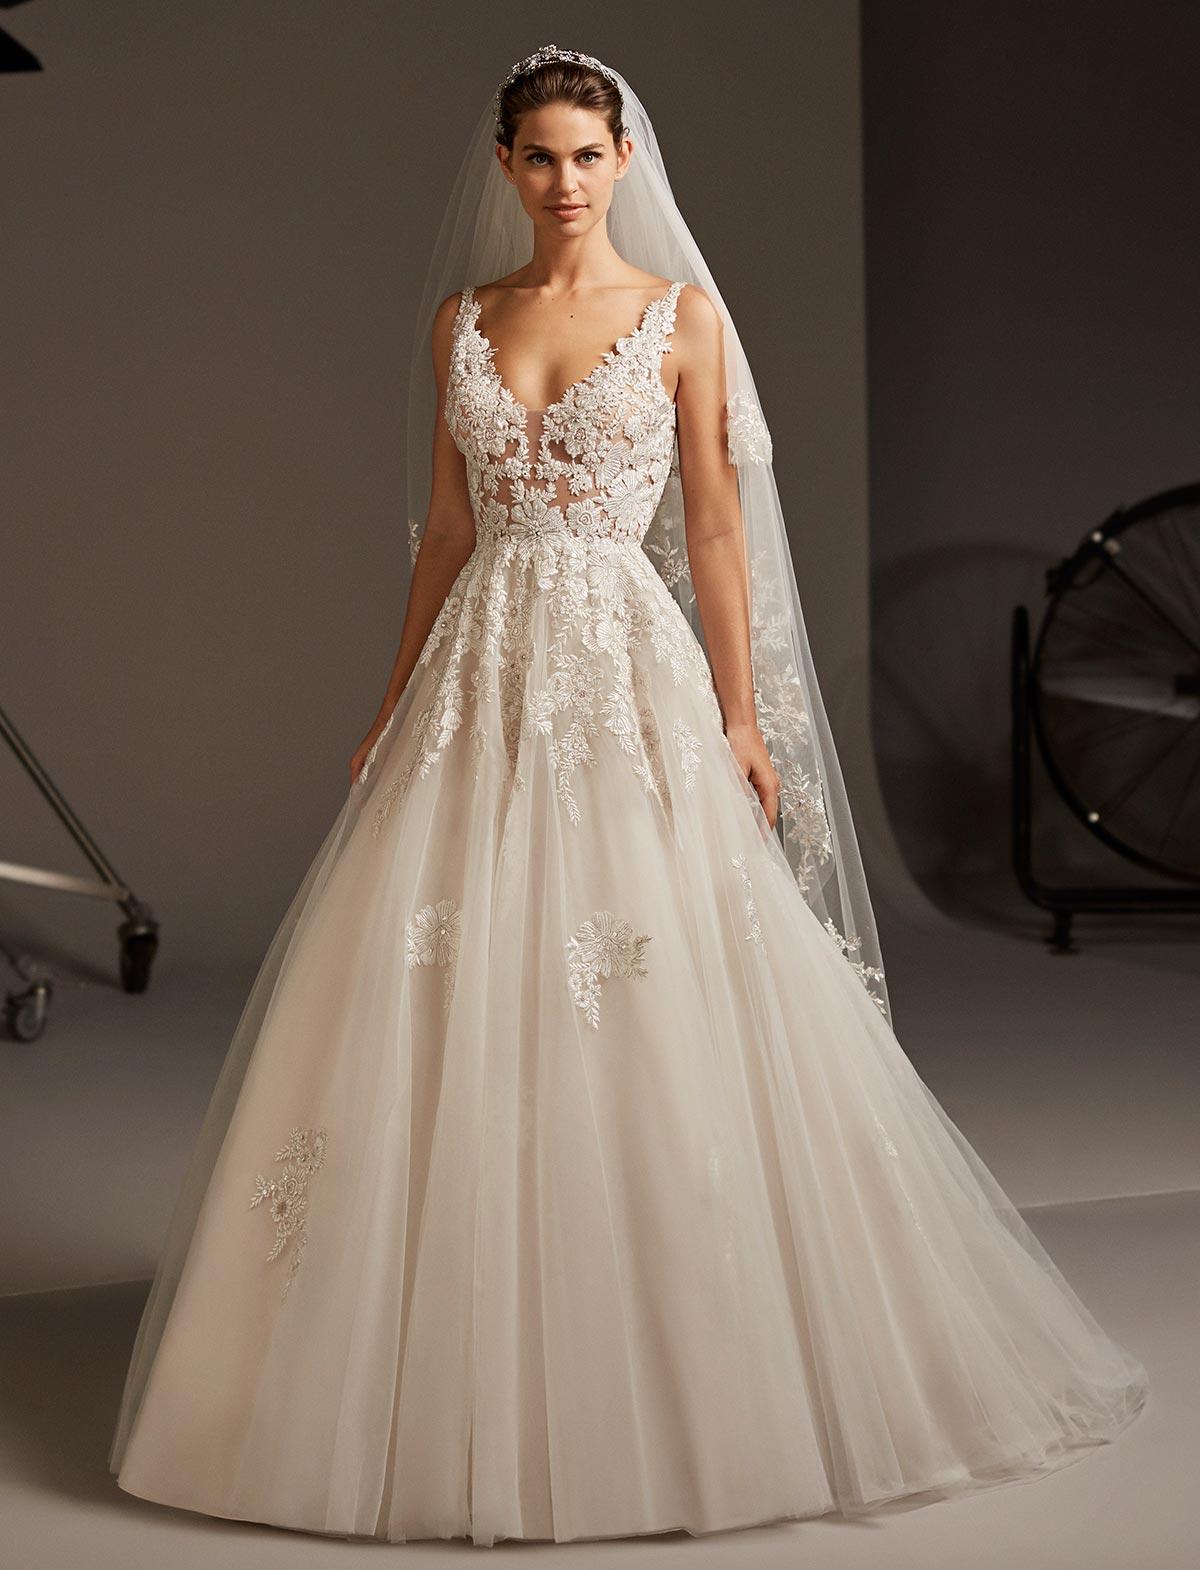 Pronovias Ariel Abito Sposa 2020